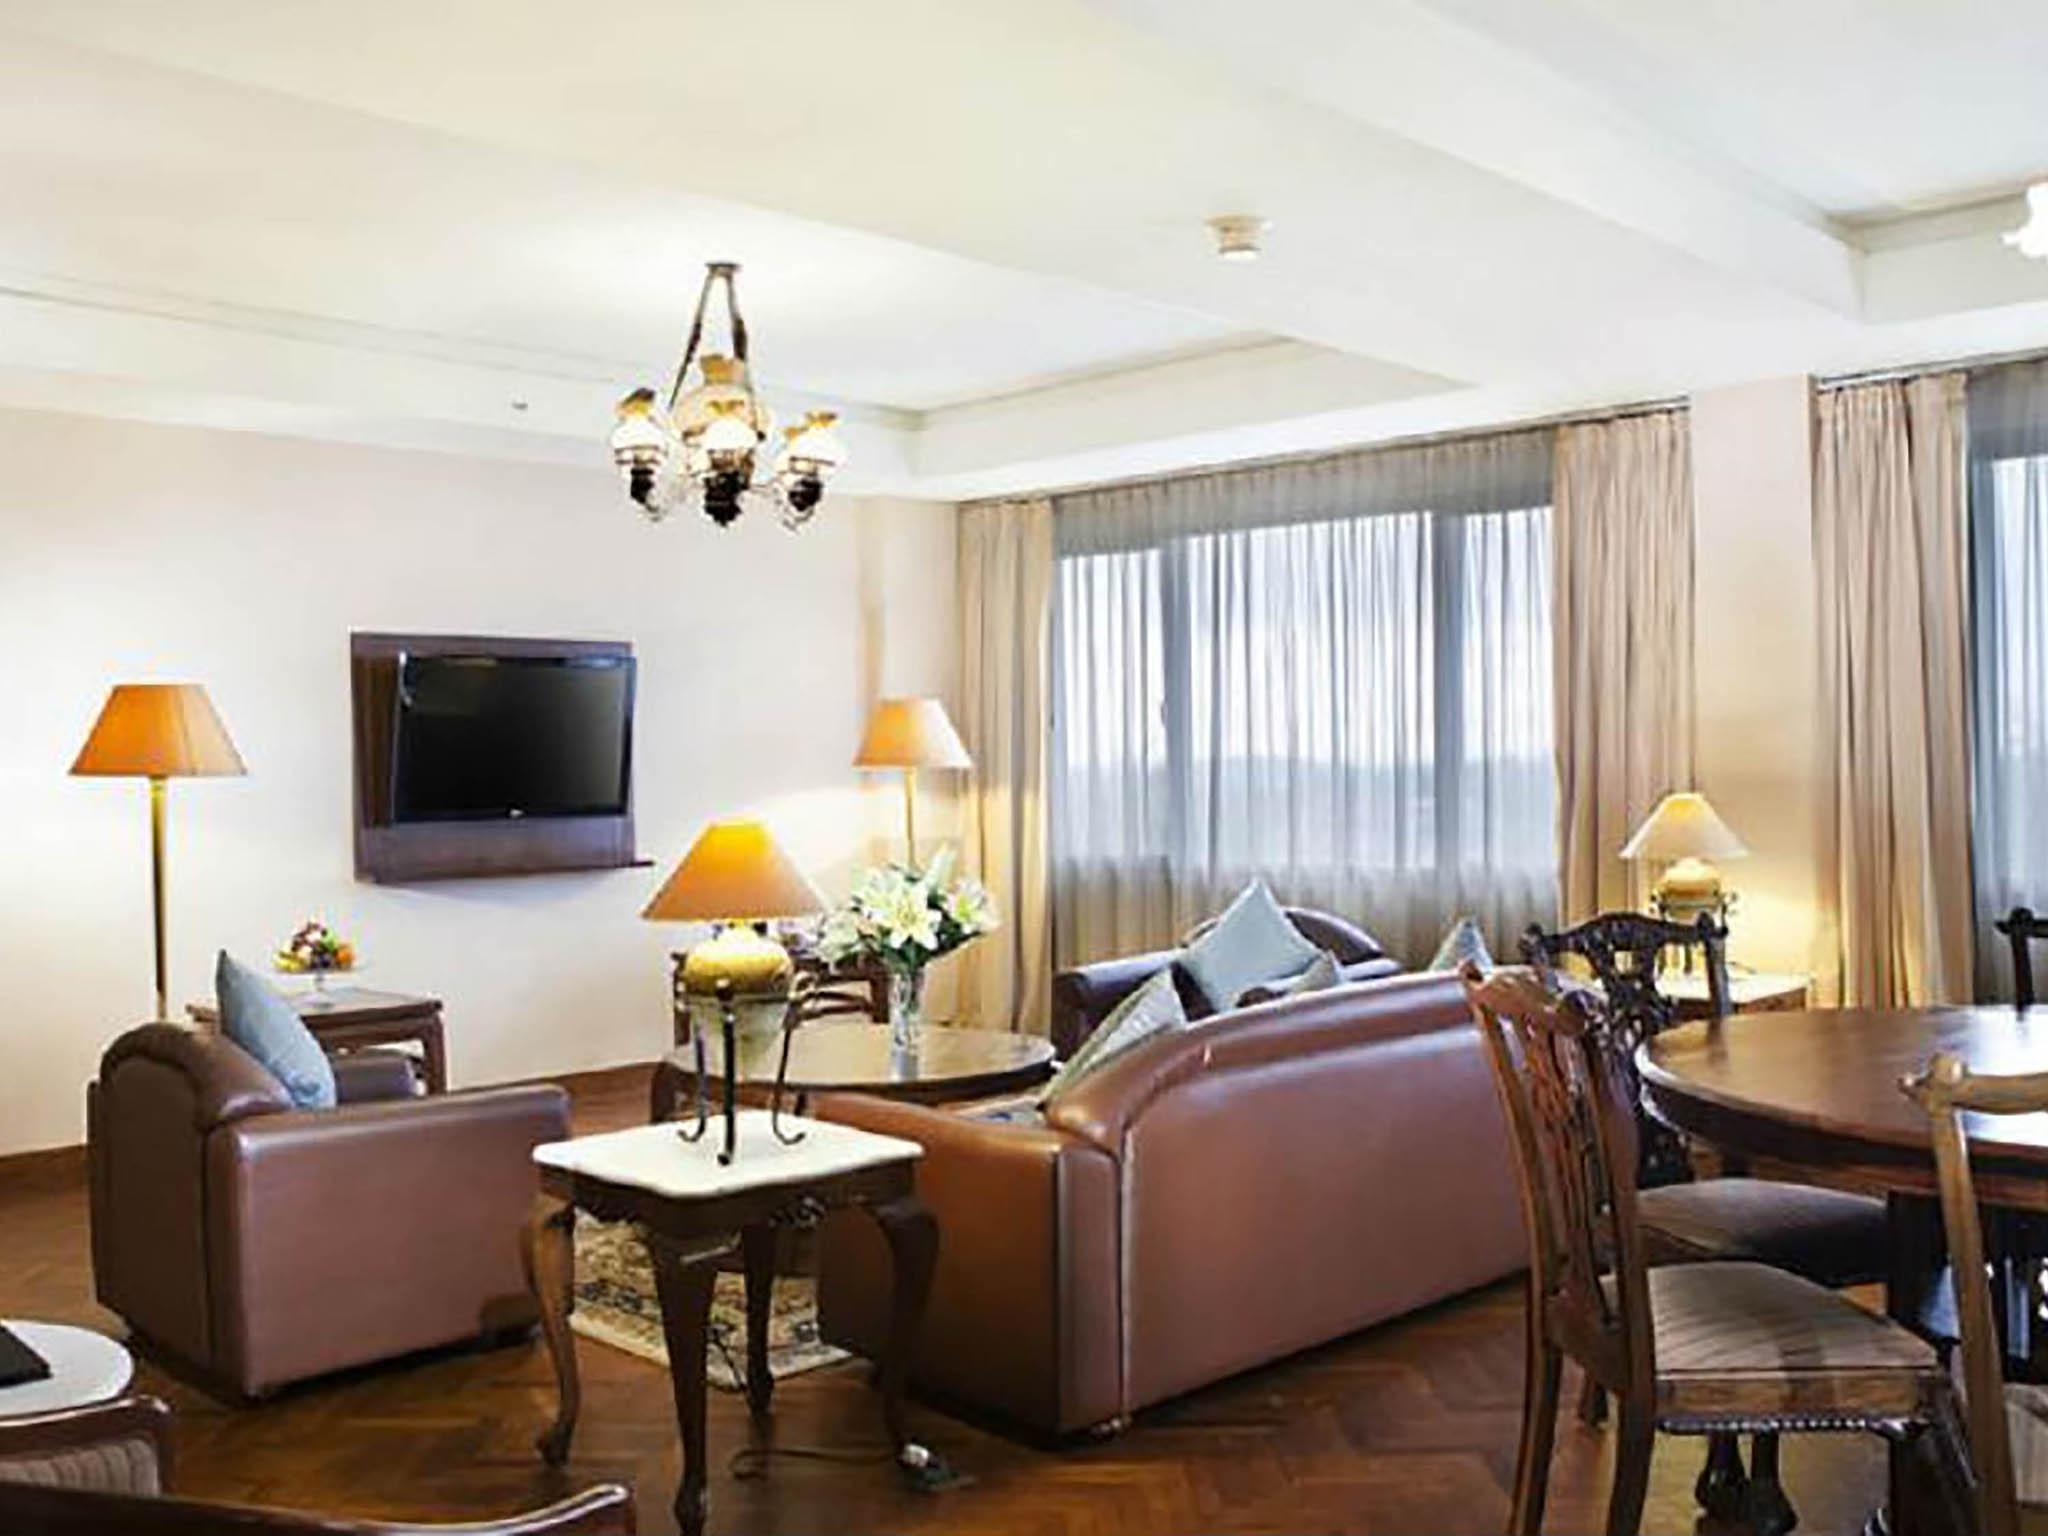 Rooms   Gq Grand Quality Hotel Yogyakarta. Hotel in YOGYAKARTA   Gq Grand Quality Hotel Yogyakarta